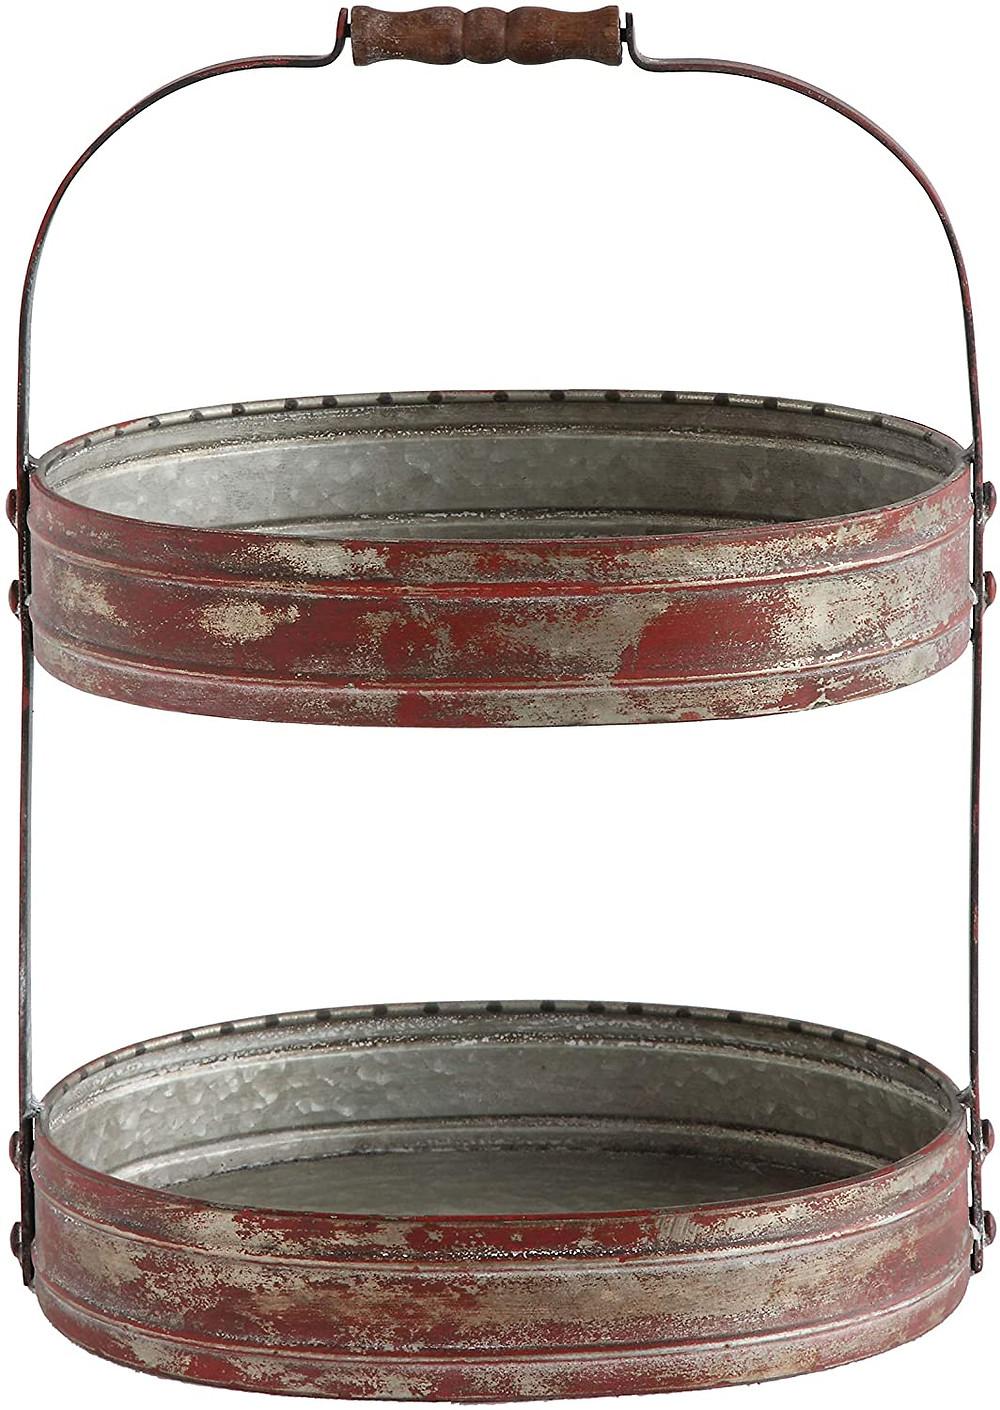 metal tray for kitchen storage